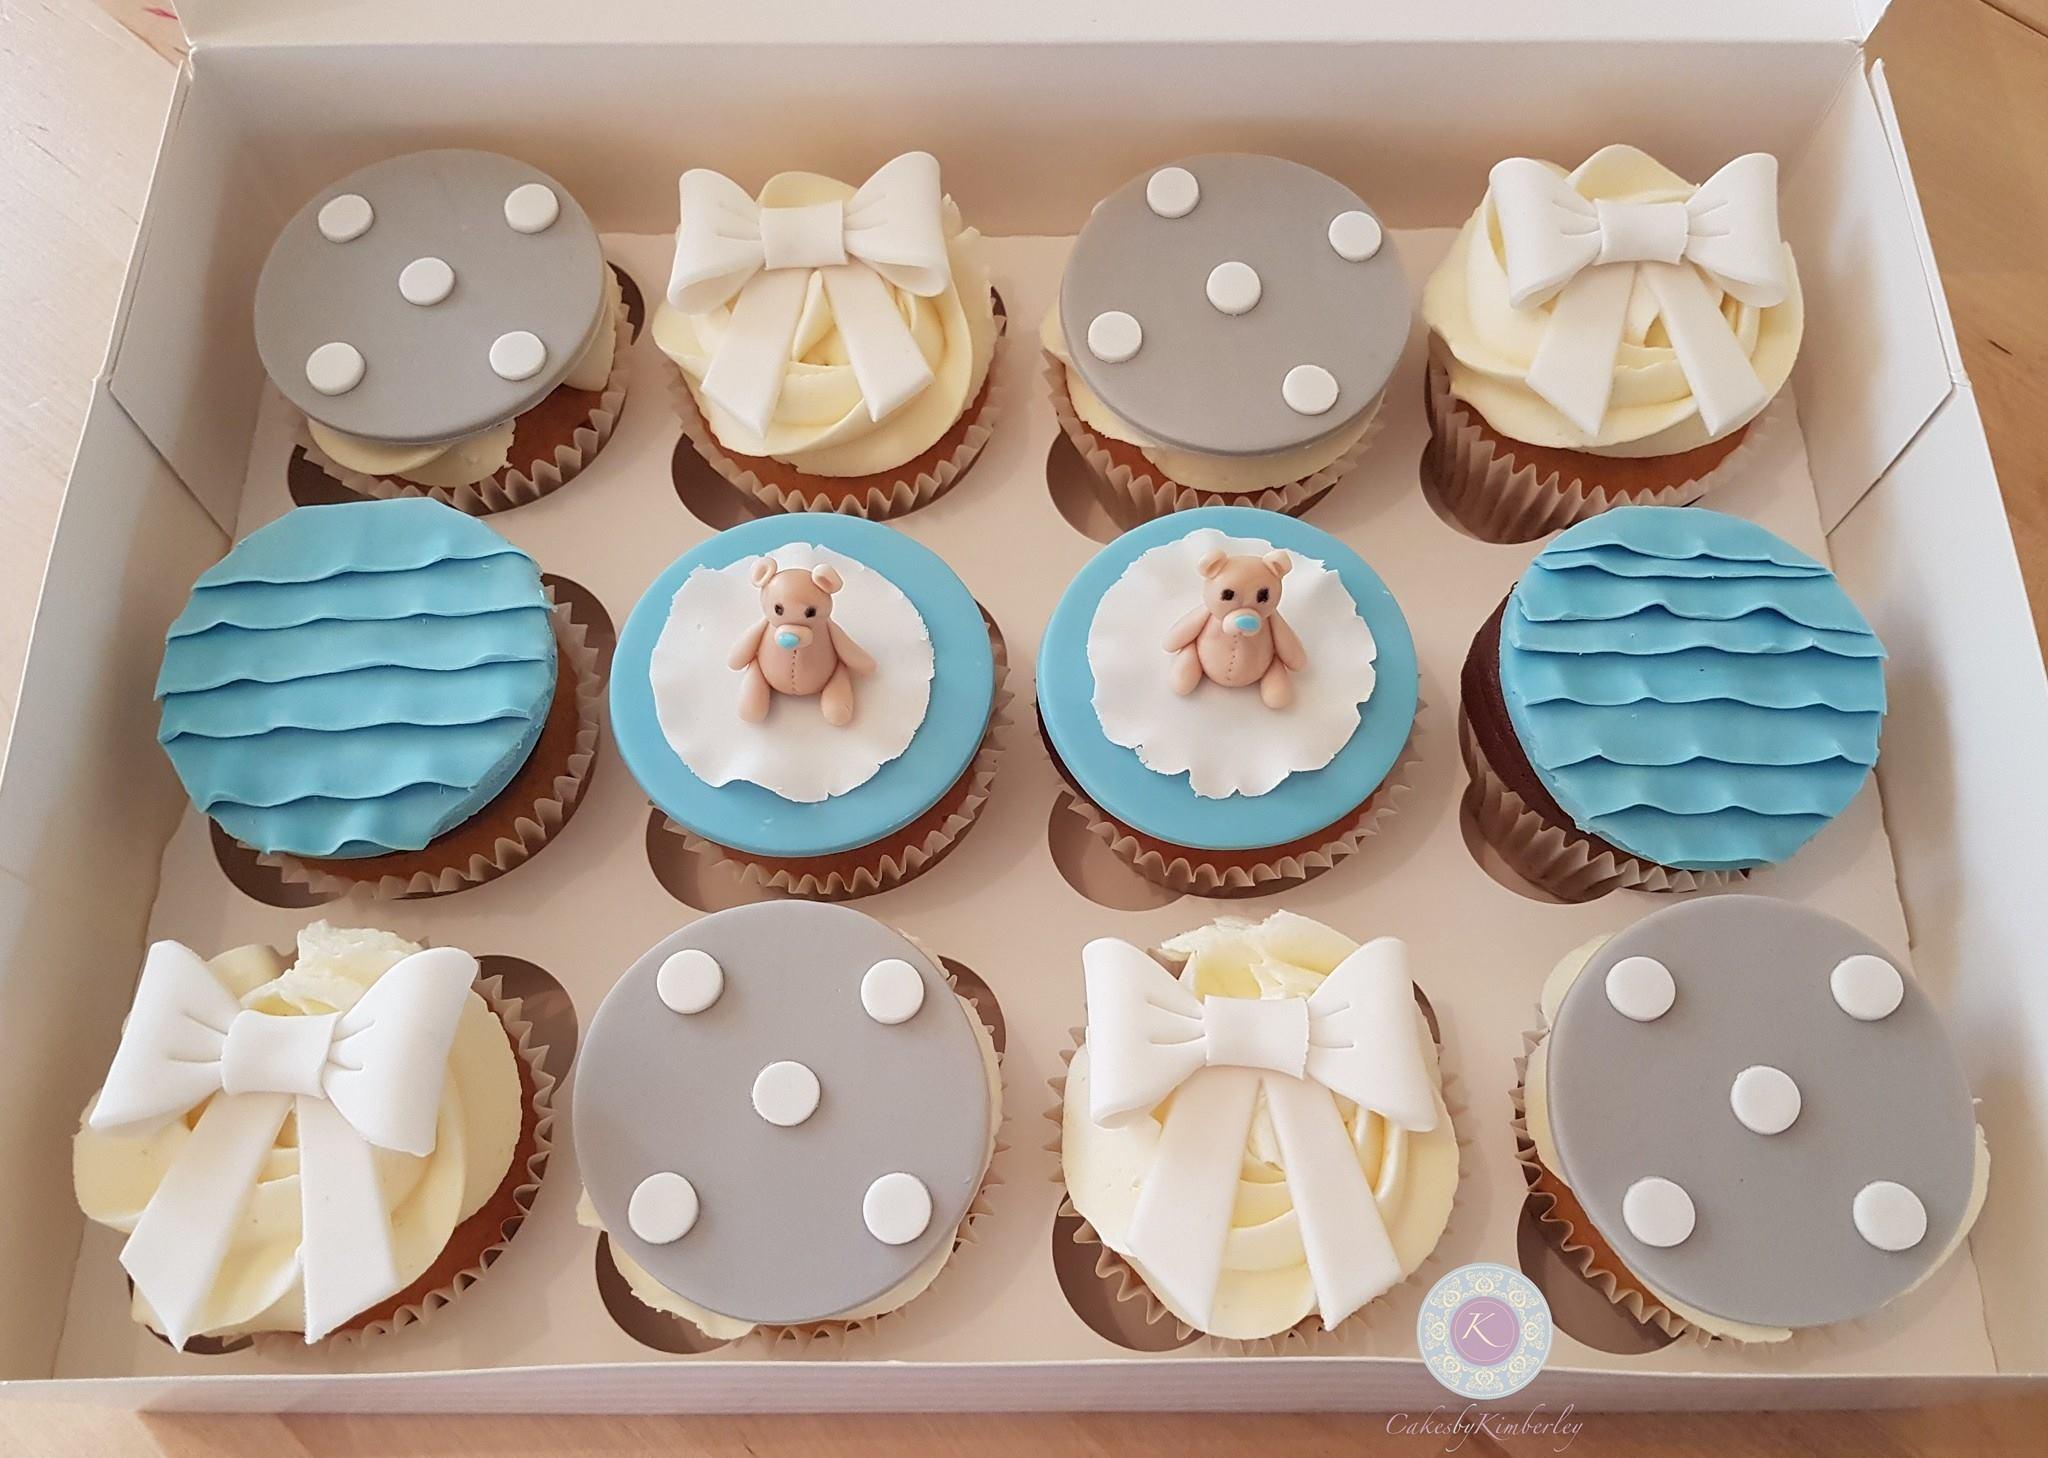 Cupcakes - Baby shower teddies